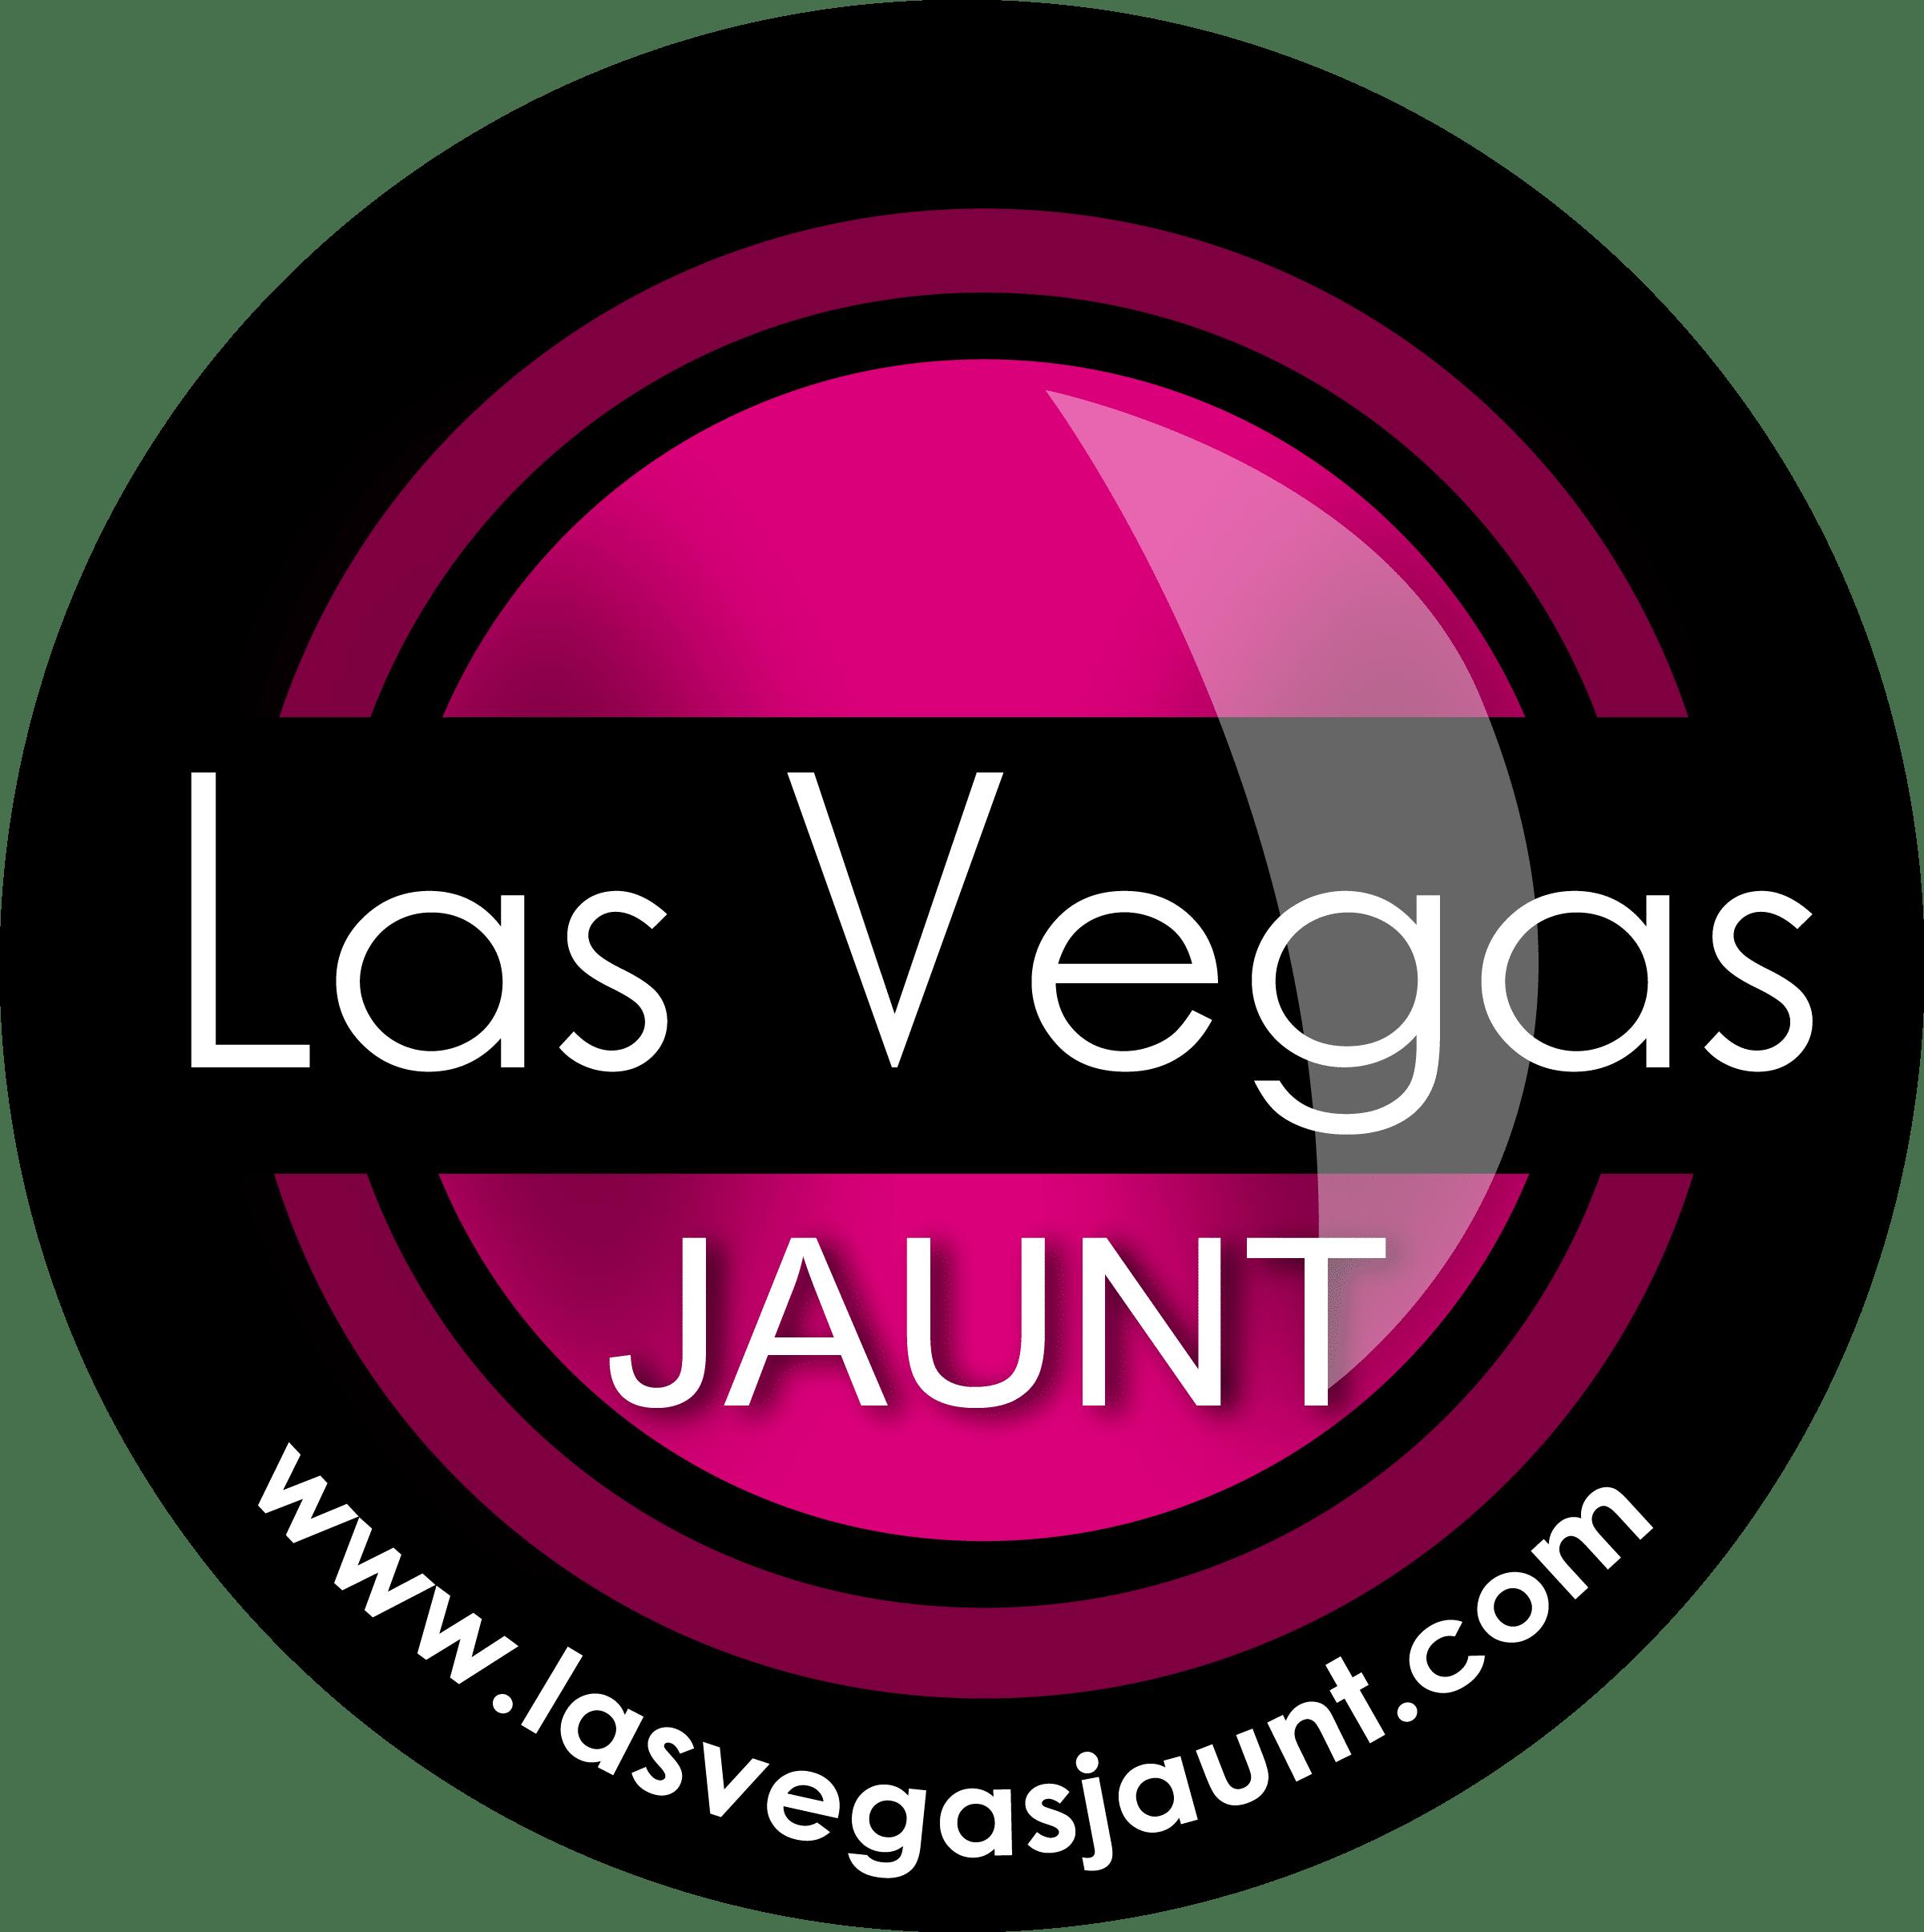 las vegas resort fees 2017 guide | lasvegasjaunt